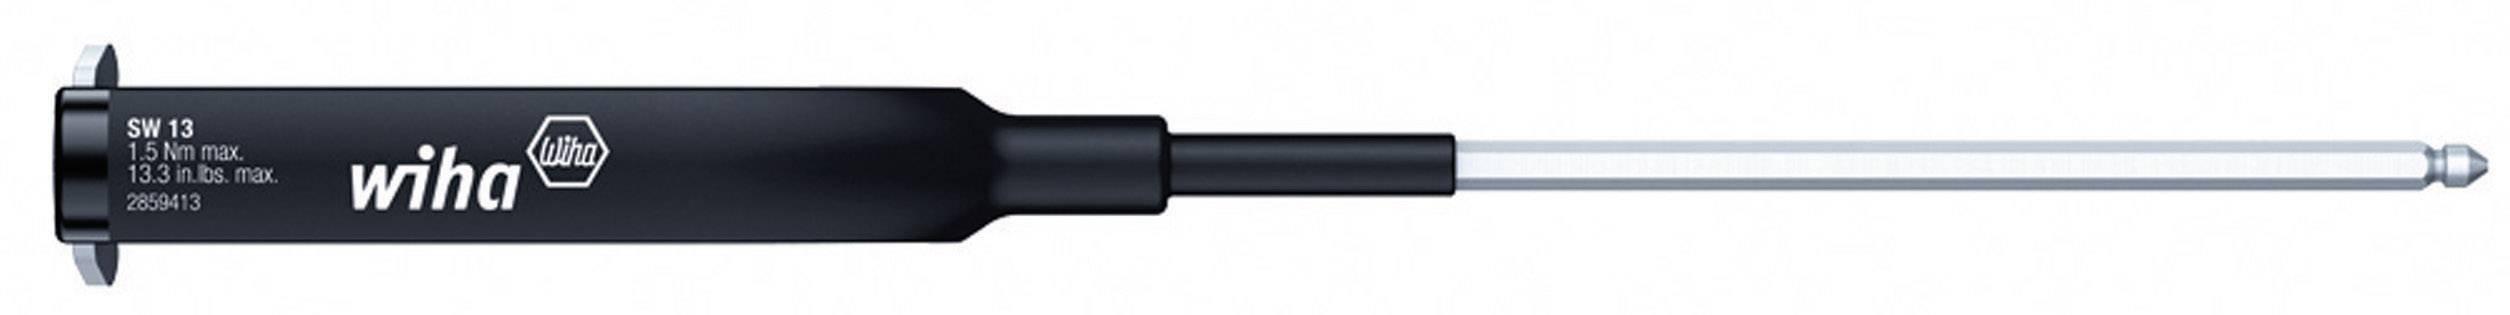 Bit momentového kľúča Wiha Torque 2859 36422, 218 mm